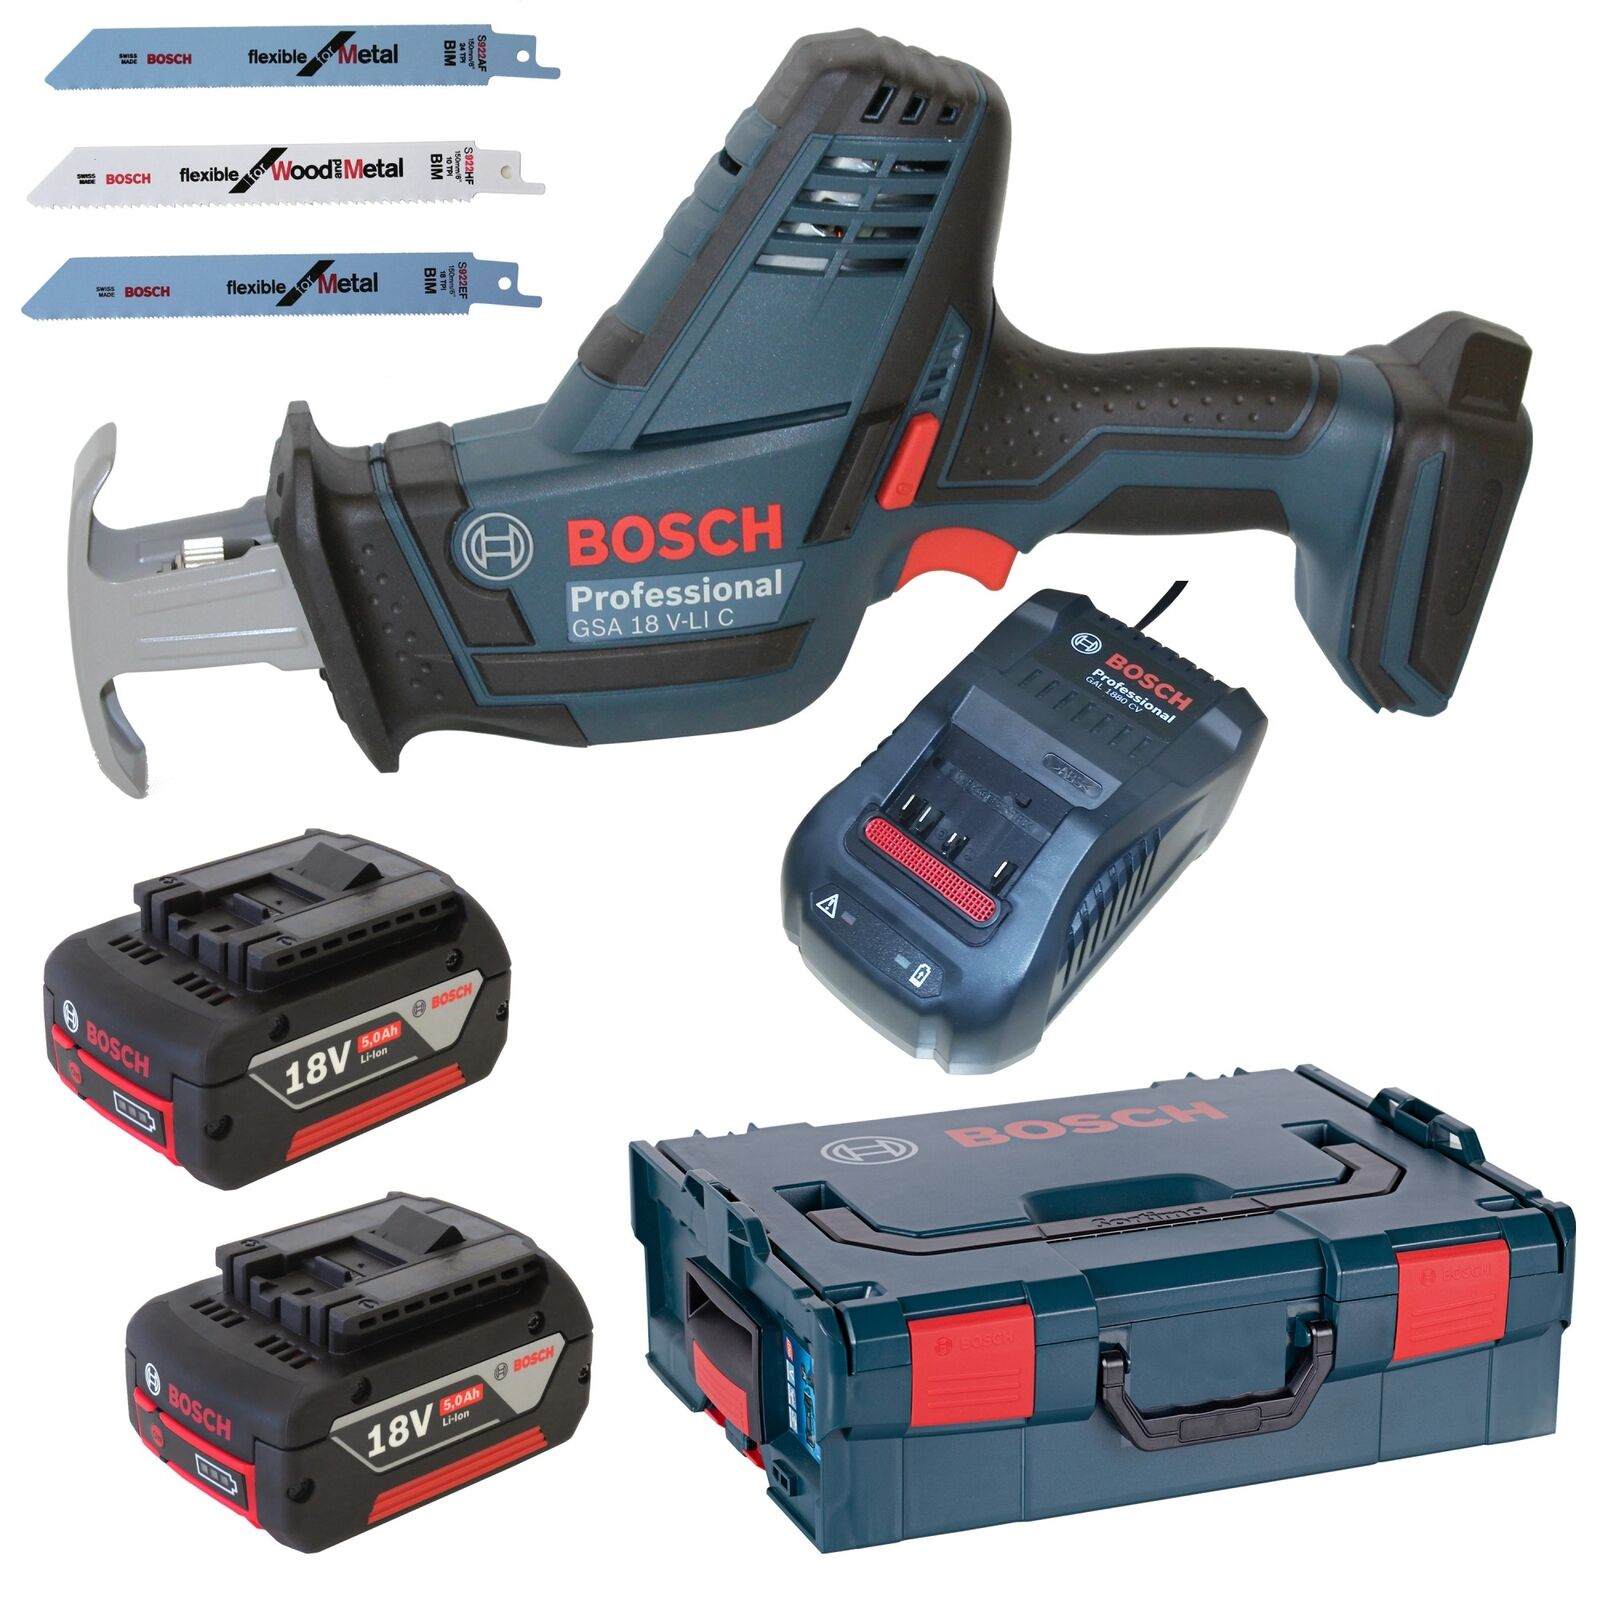 Bosch Akku-Säbelsäge GSA 18 V-LI C Prof.+ 2x 5,0AH Akku+ Ladegerät+ L-Boxx Gr. 2